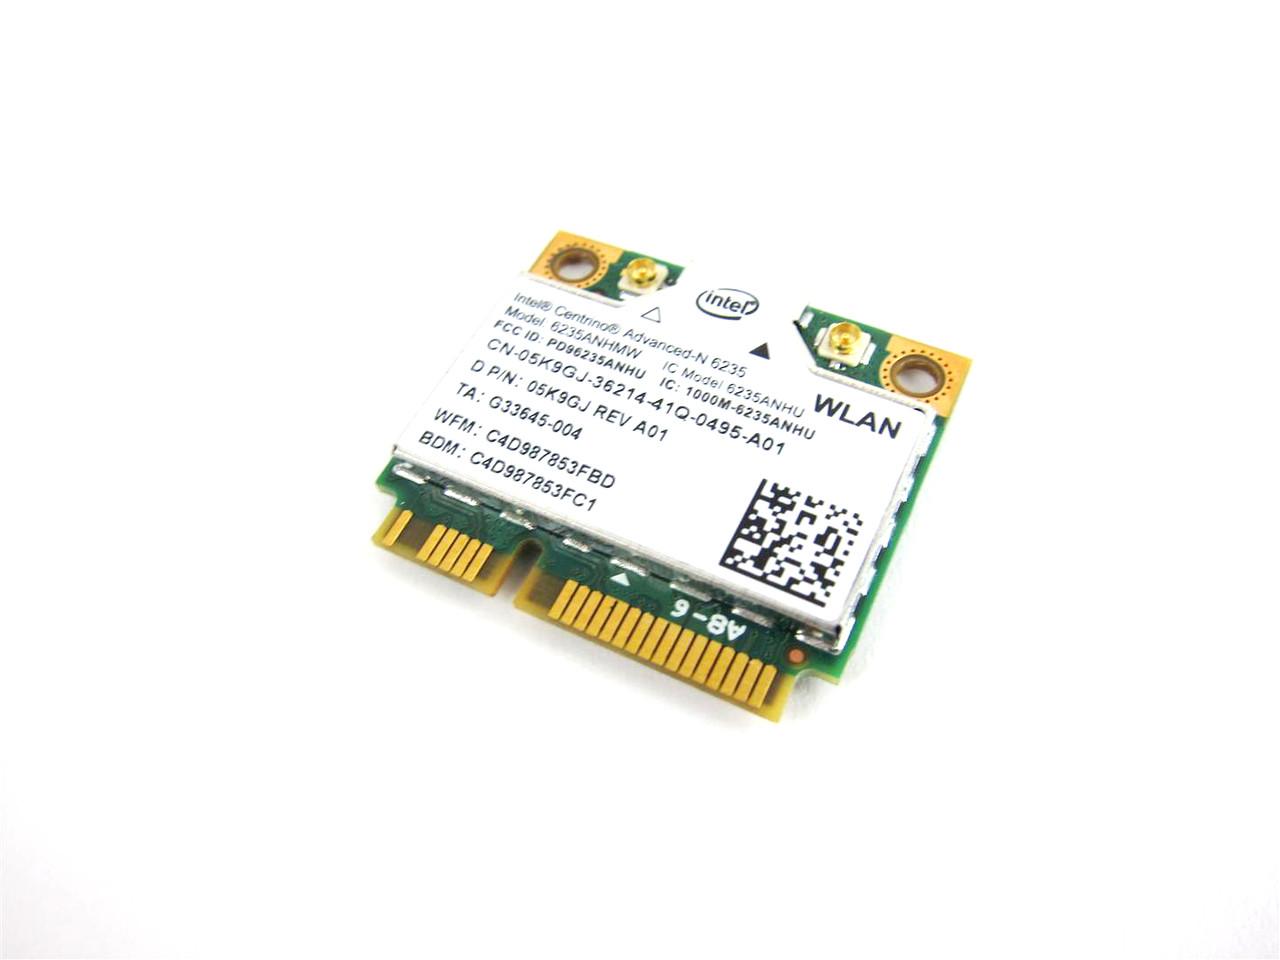 Dell Intel Centrino Advanced-N 6235 Wireless WiFi 802.11 a/g/n / BlueTooth Half-Height Mini-PCI Express Card - 5K9GJ